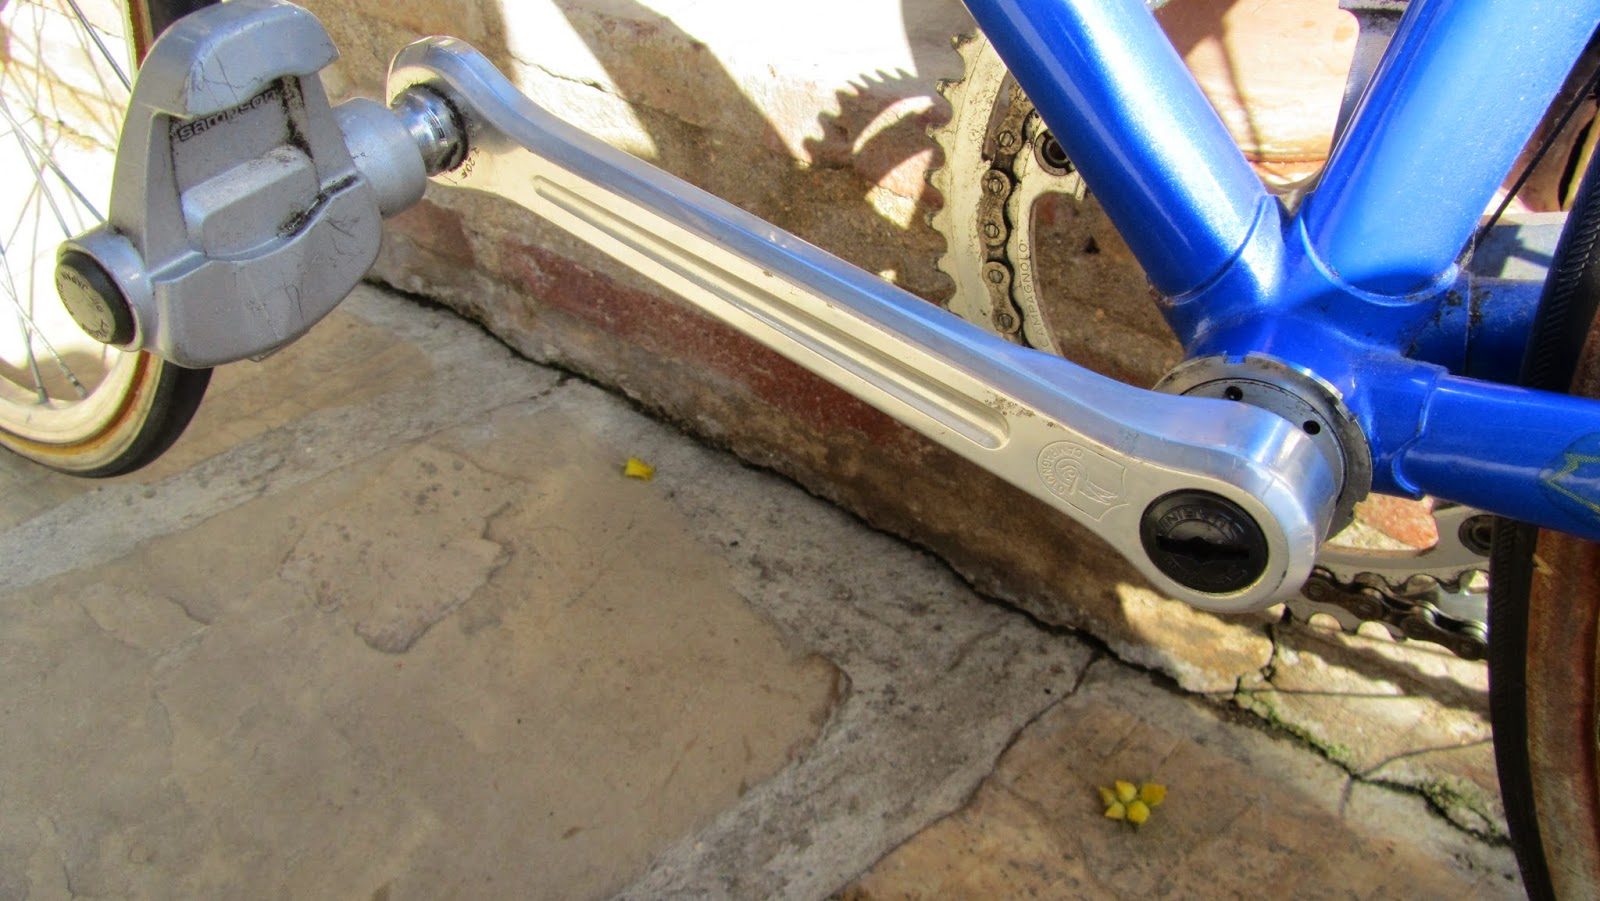 bicicleta orbea contrarreloj - biela campagnolo